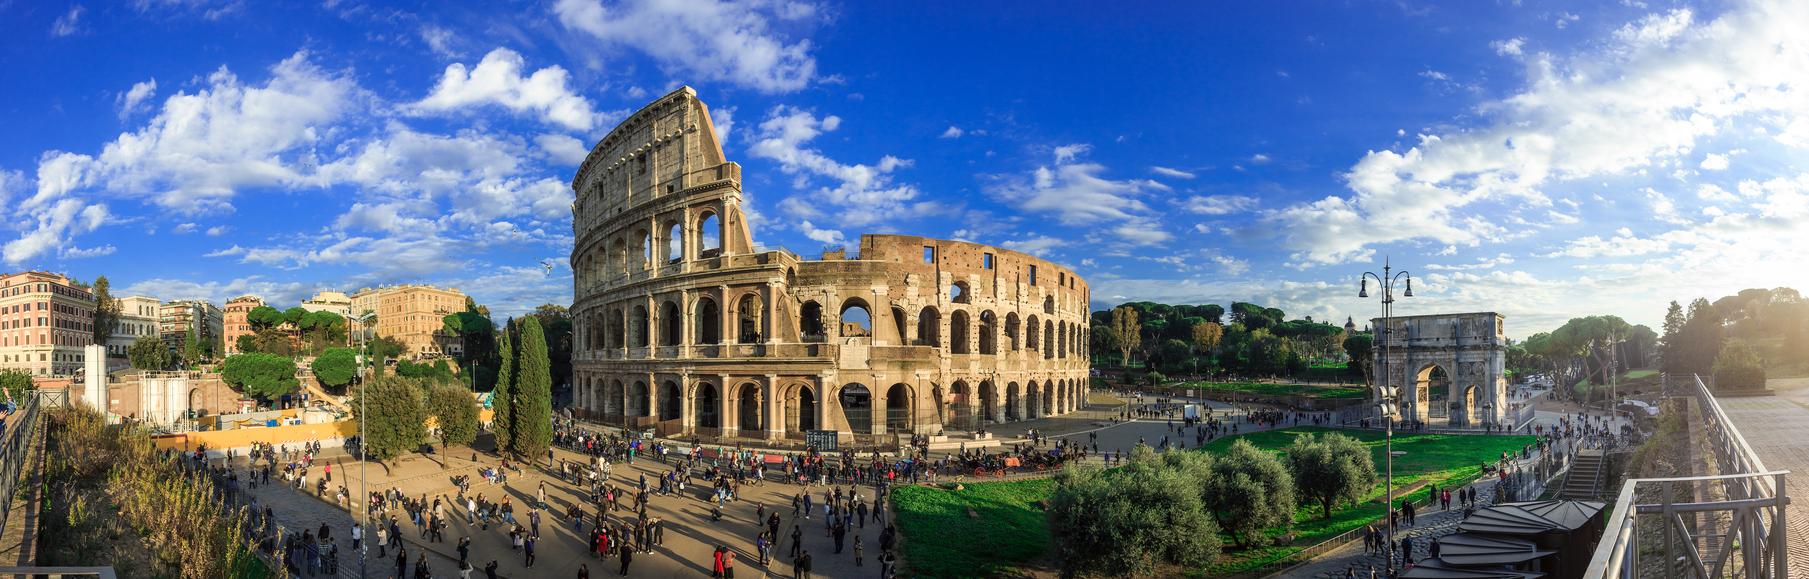 Find SAP Jobs in Italy | SAP Careers Italy | Eursap